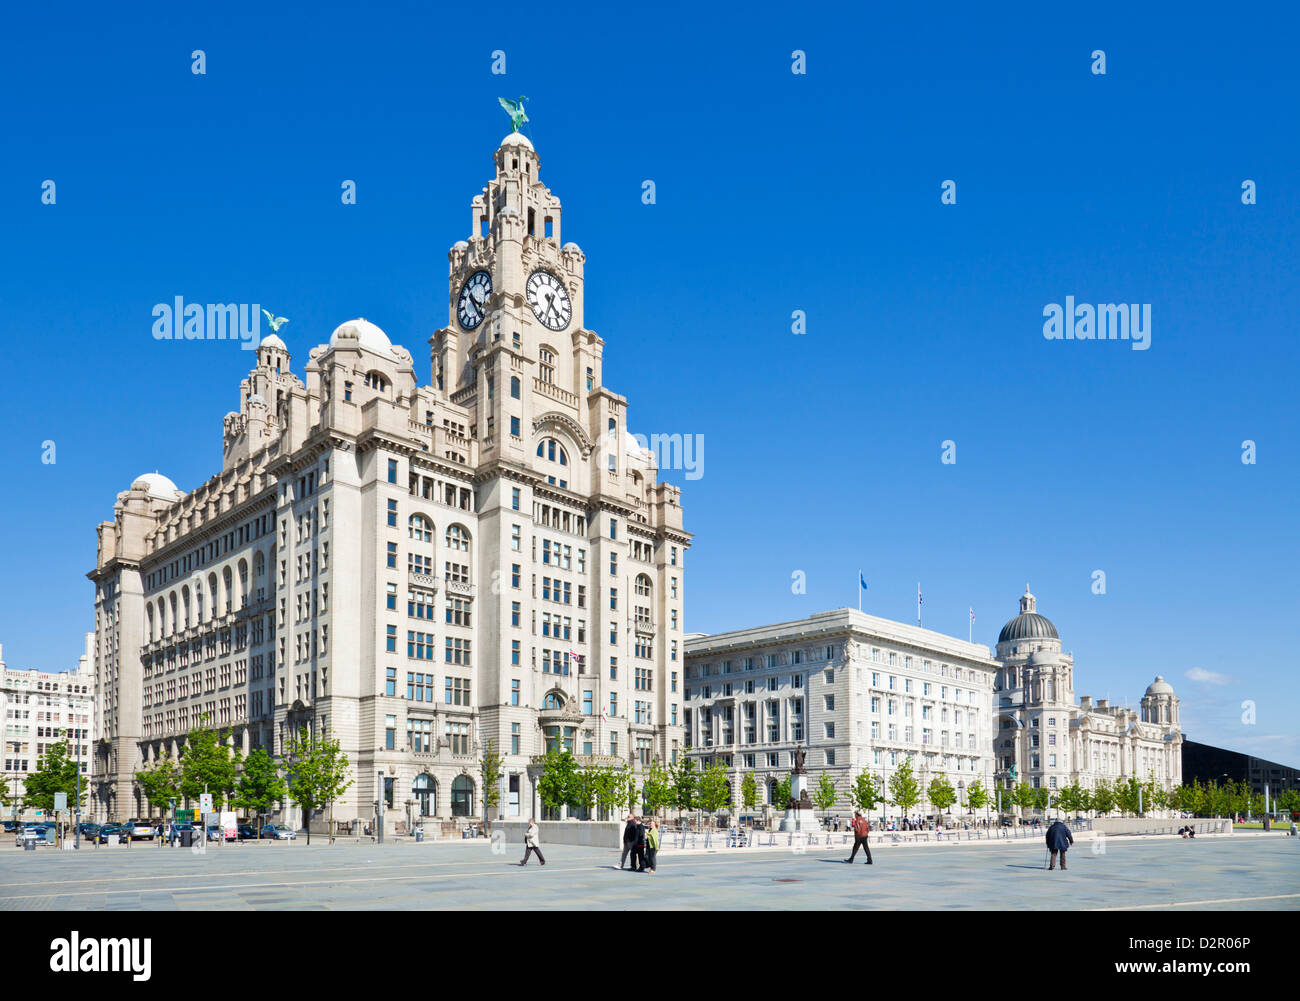 Drei Grazien Gebäude, Pierhead, Liverpool Waterfront, Liverpool, Merseyside, England, UK Stockbild